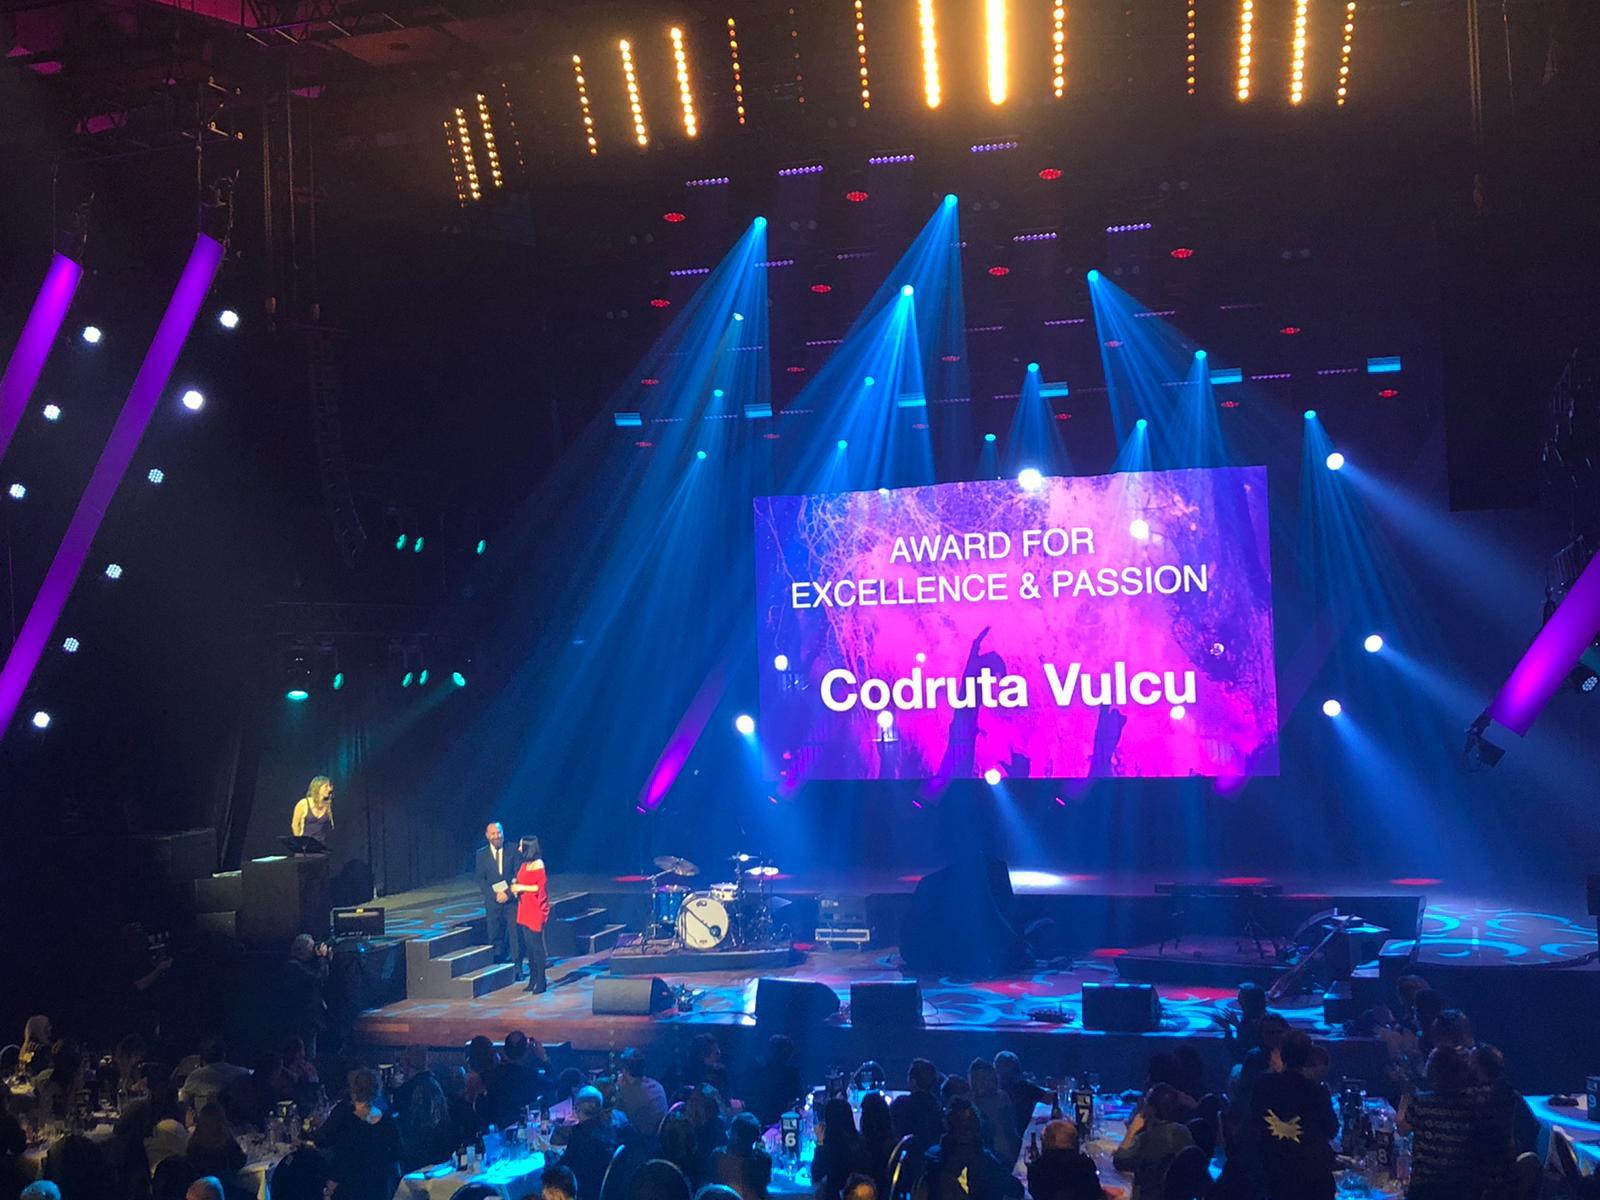 CodrutaVulcu_Award4Excellence&Passion_European Festival Awards_1